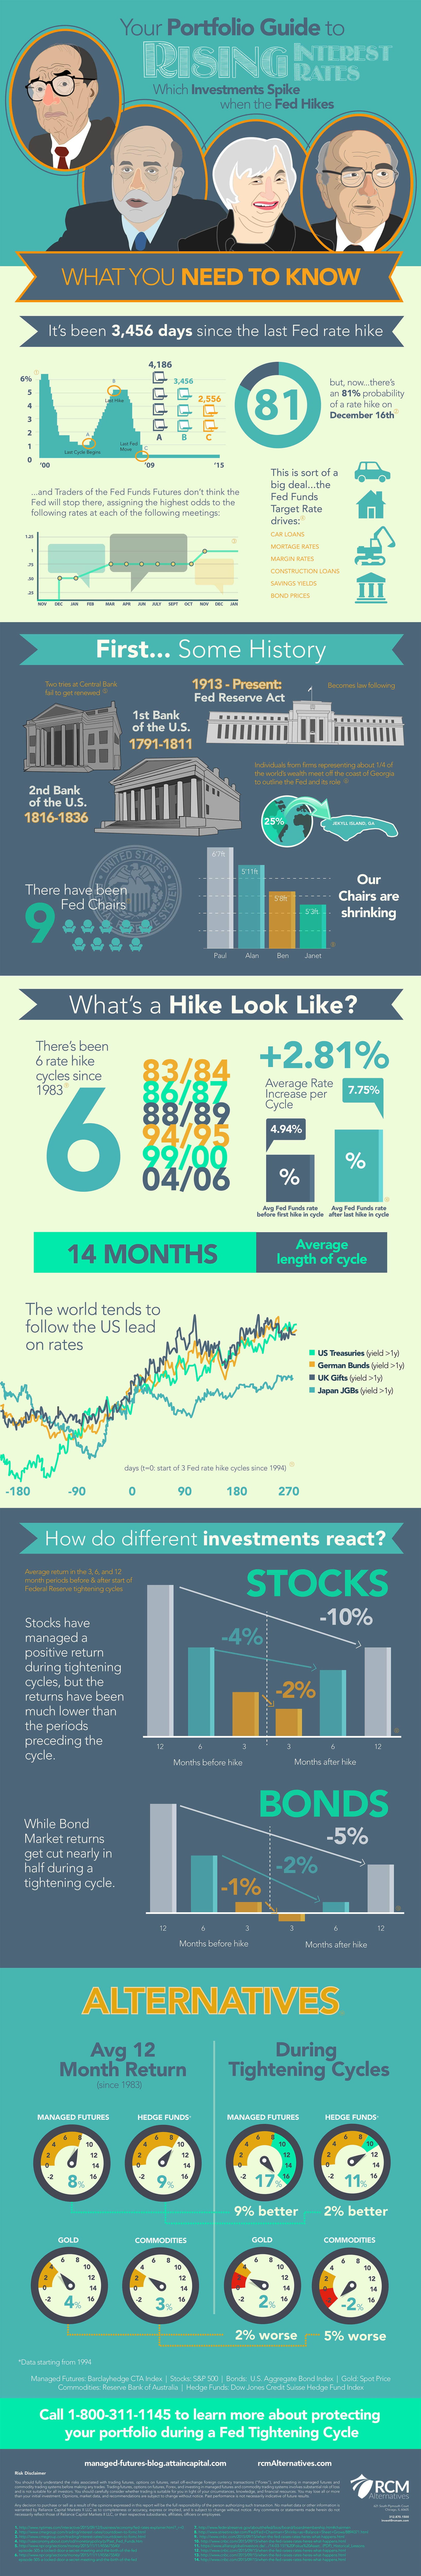 Your Portfolio Guide to rising interest rates RCM Alternatives